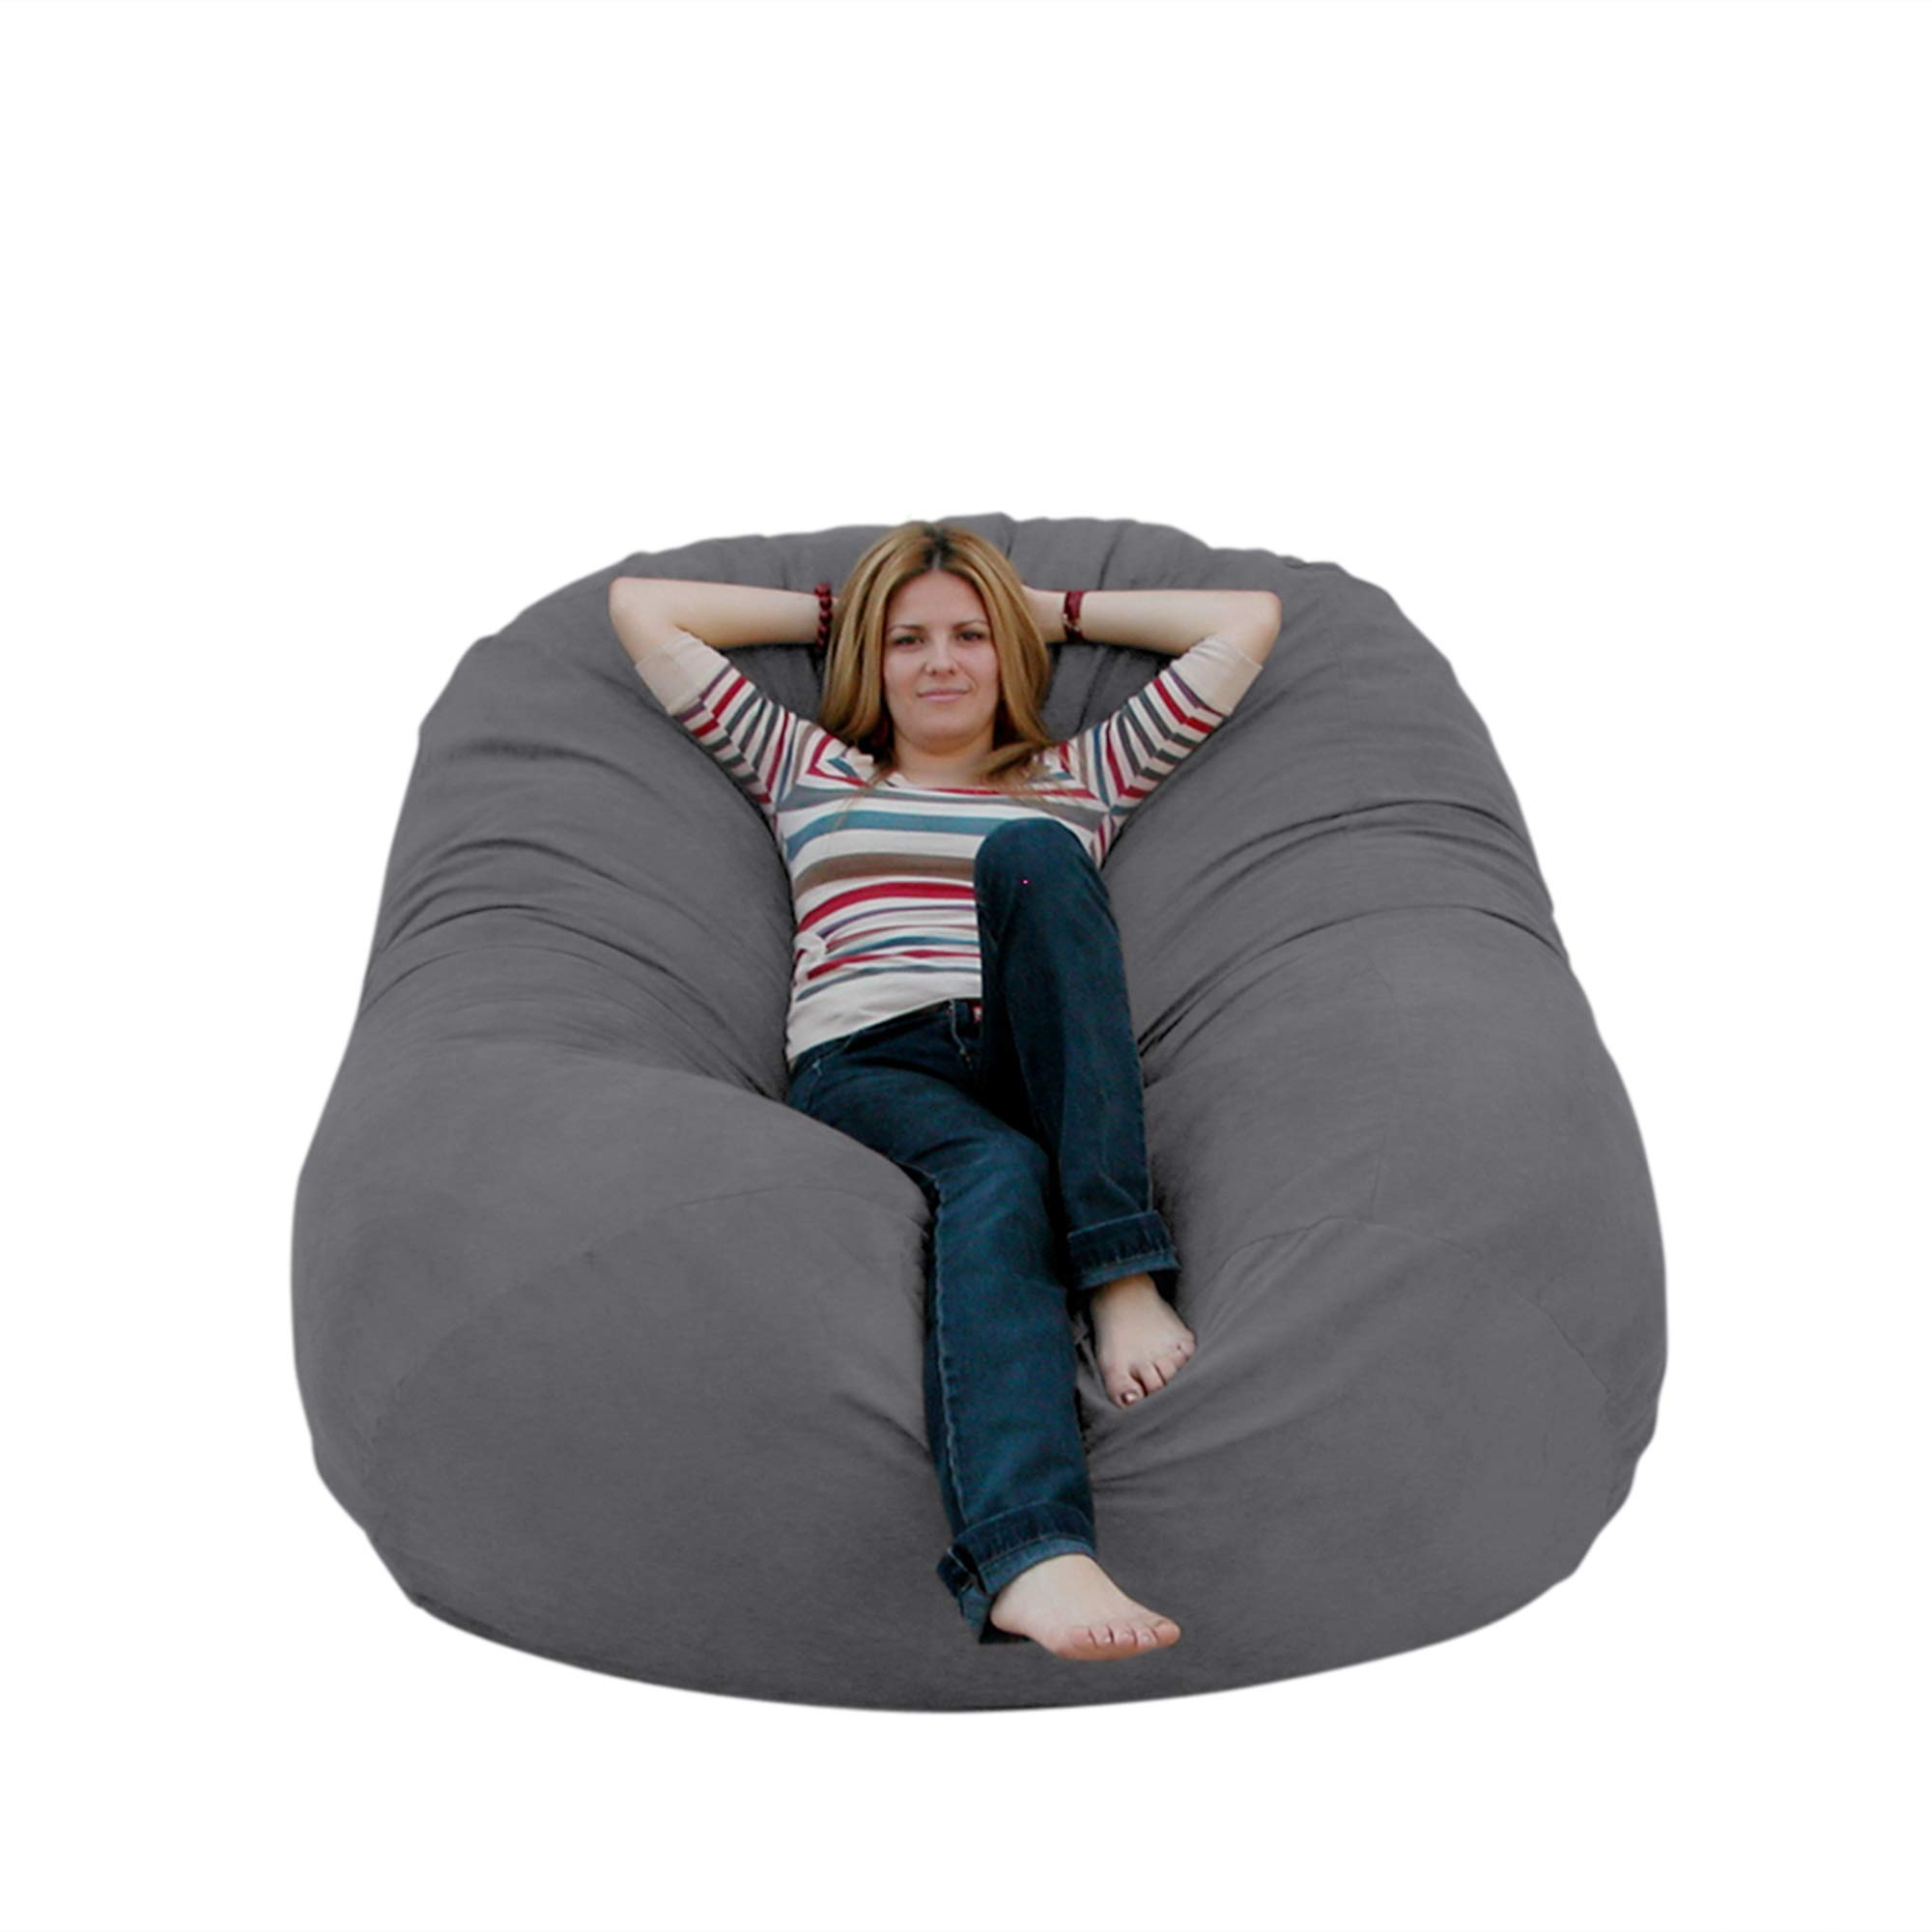 Cozy Sack 6-Feet Bean Bag Chair, Large, Grey by Cozy Sack